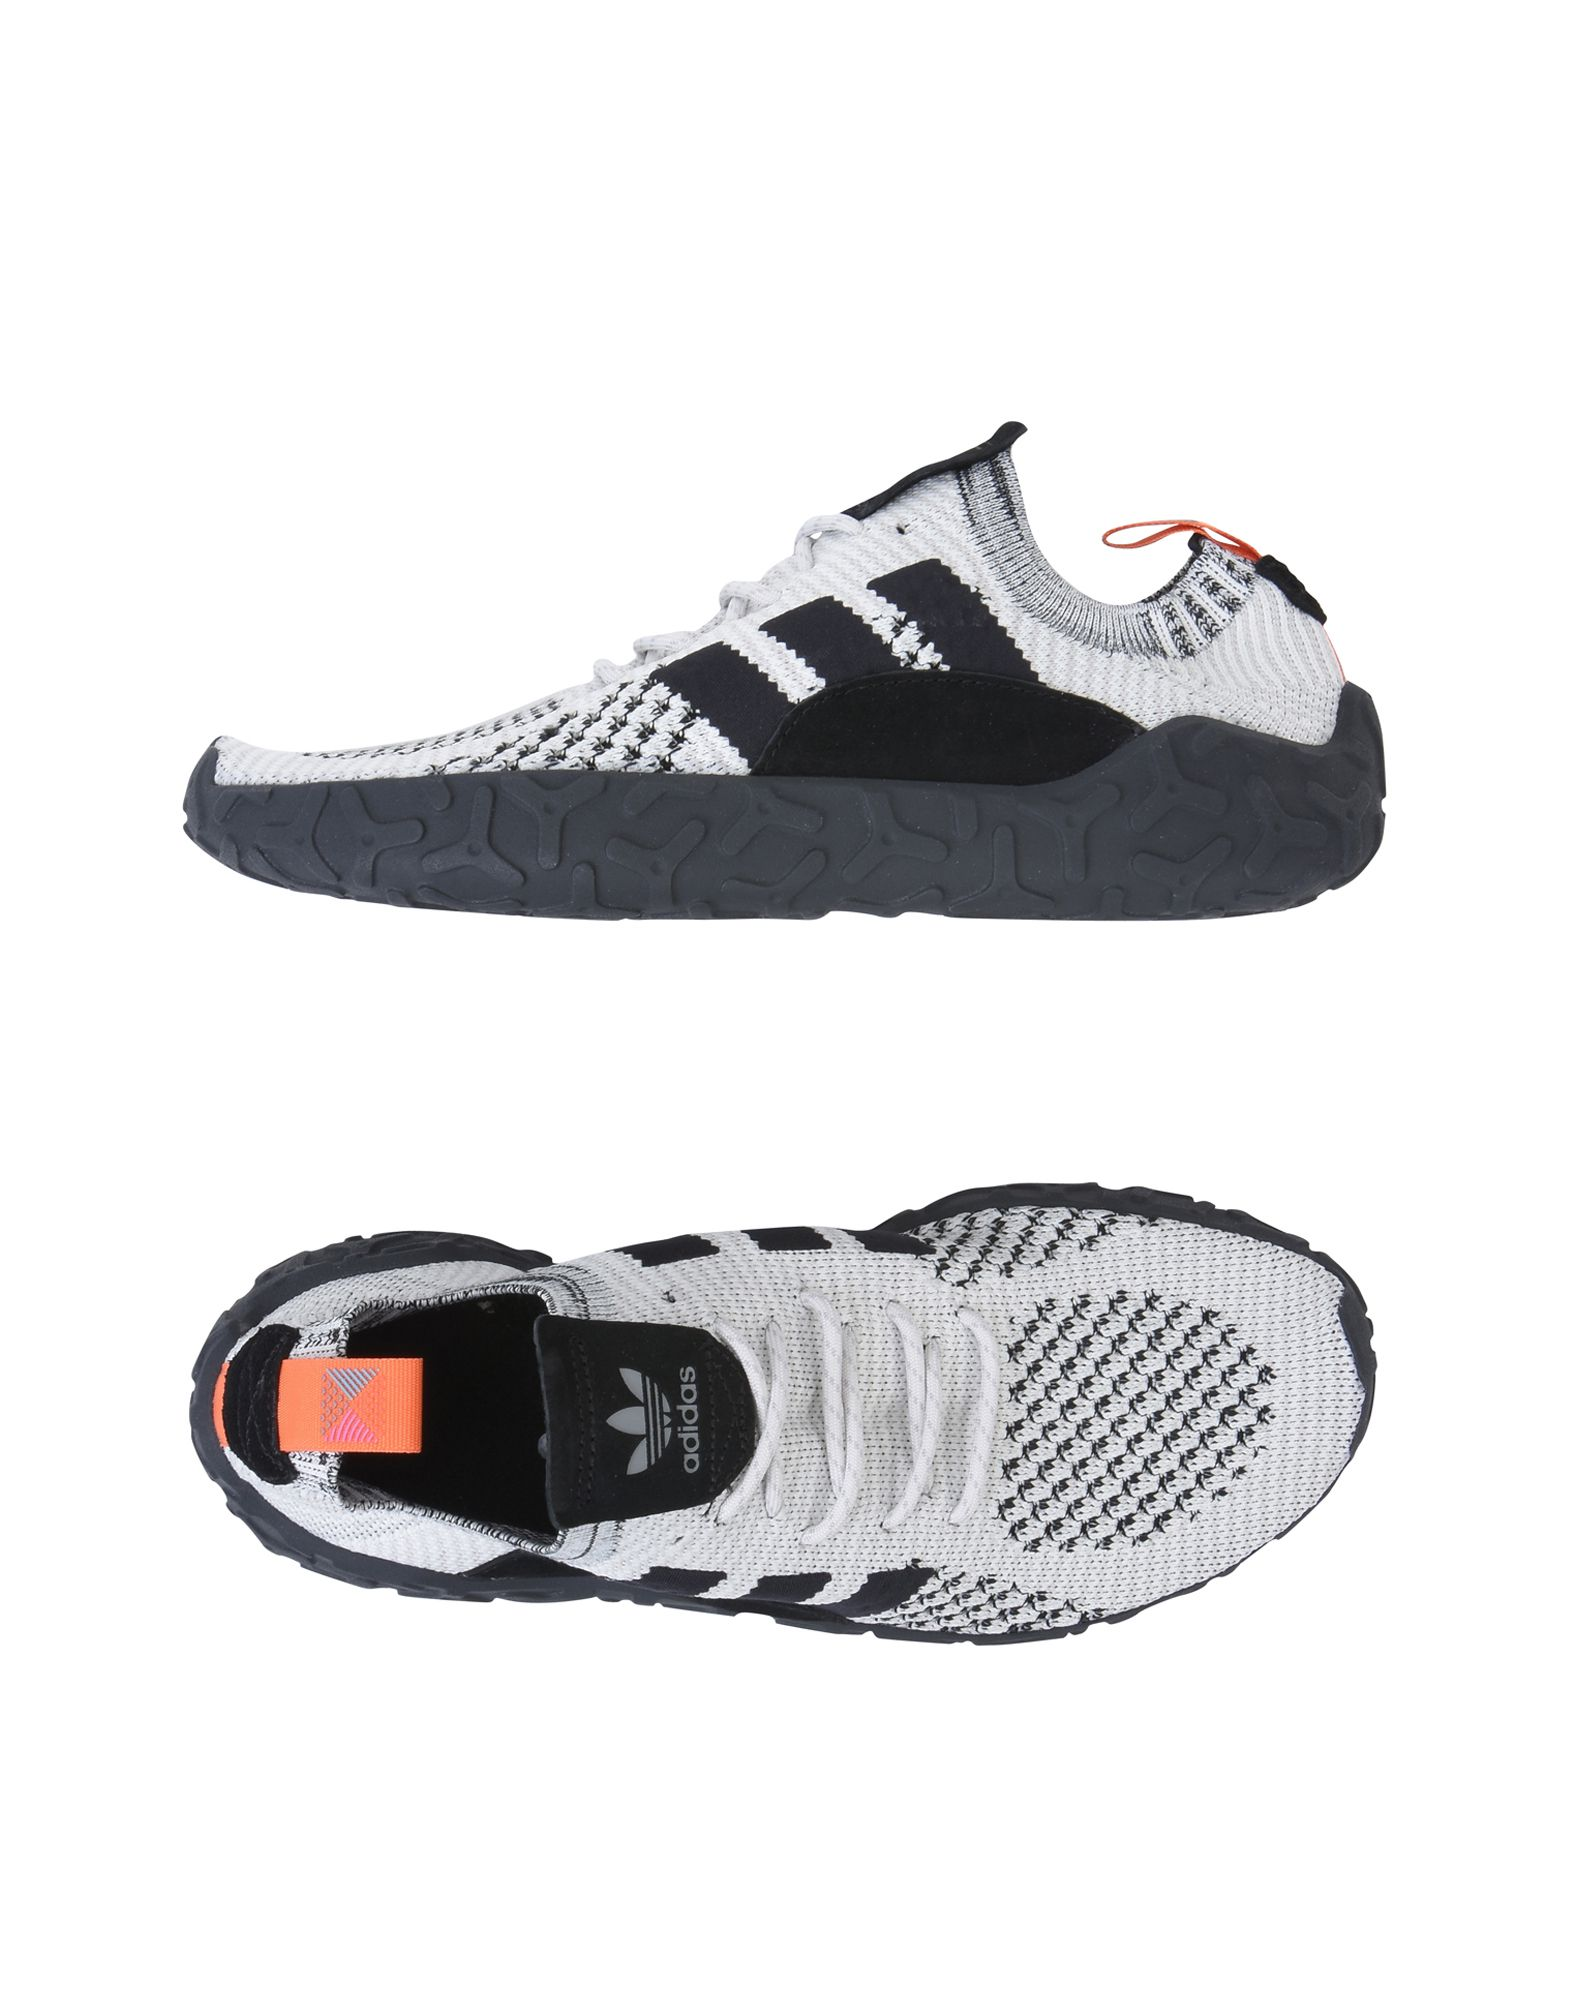 best service 0077b 1a44c Adidas Originals Παπουτσια Παπούτσια Τένις Χαμηλά